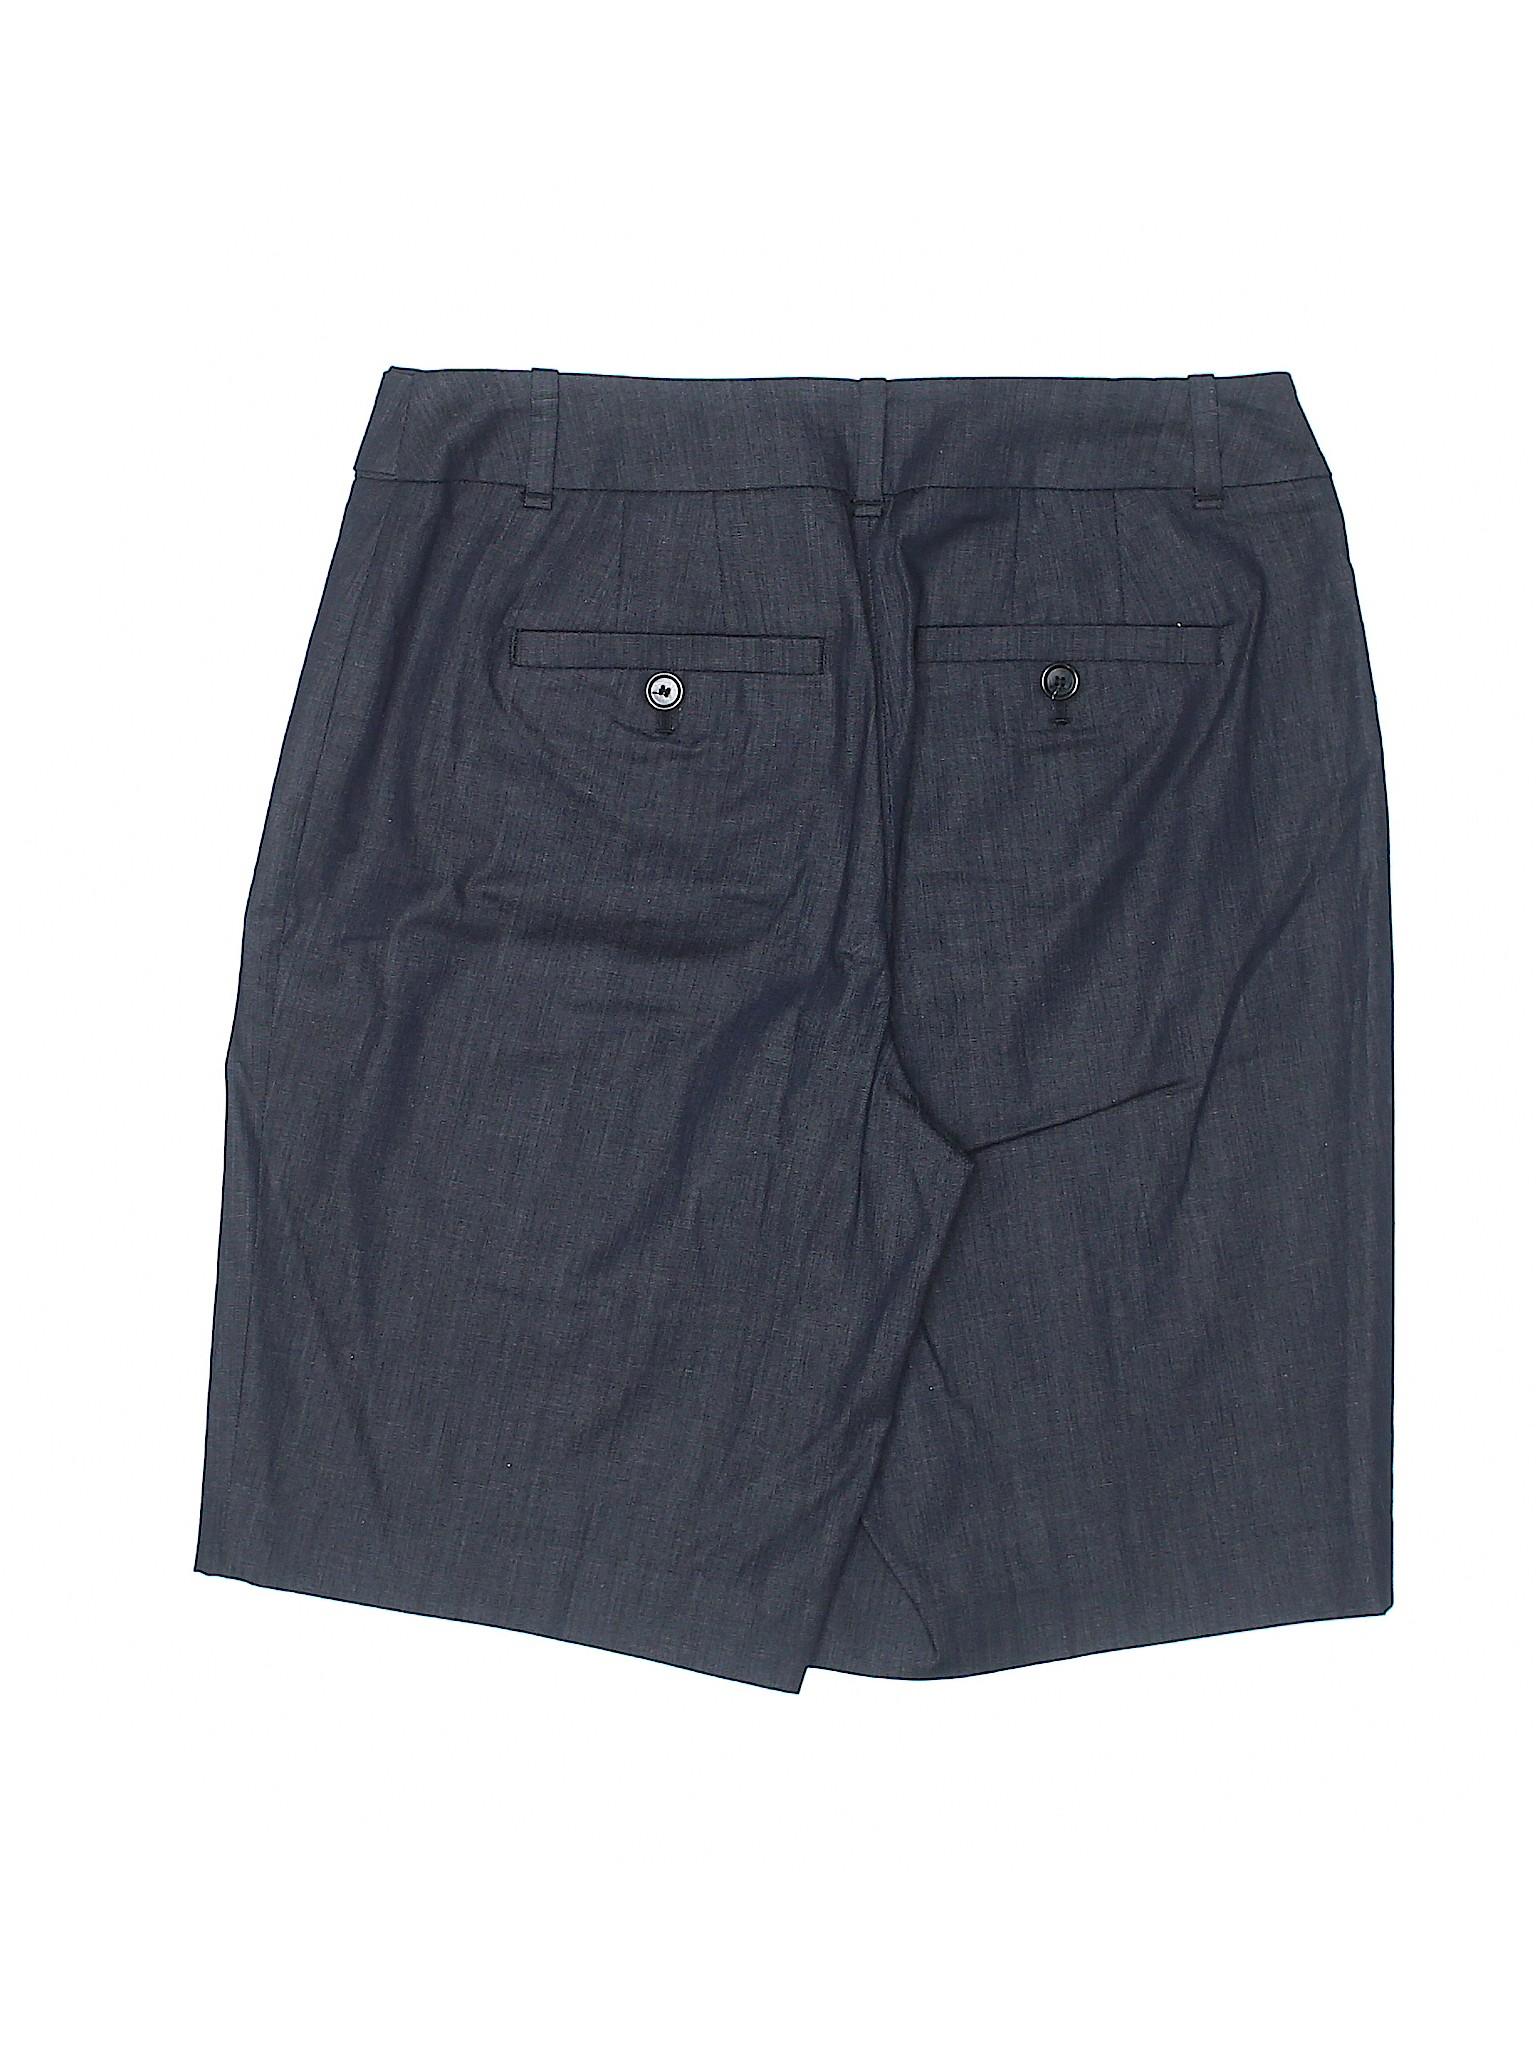 Taylor Dressy Boutique Shorts LOFT Ann zBXgxqO